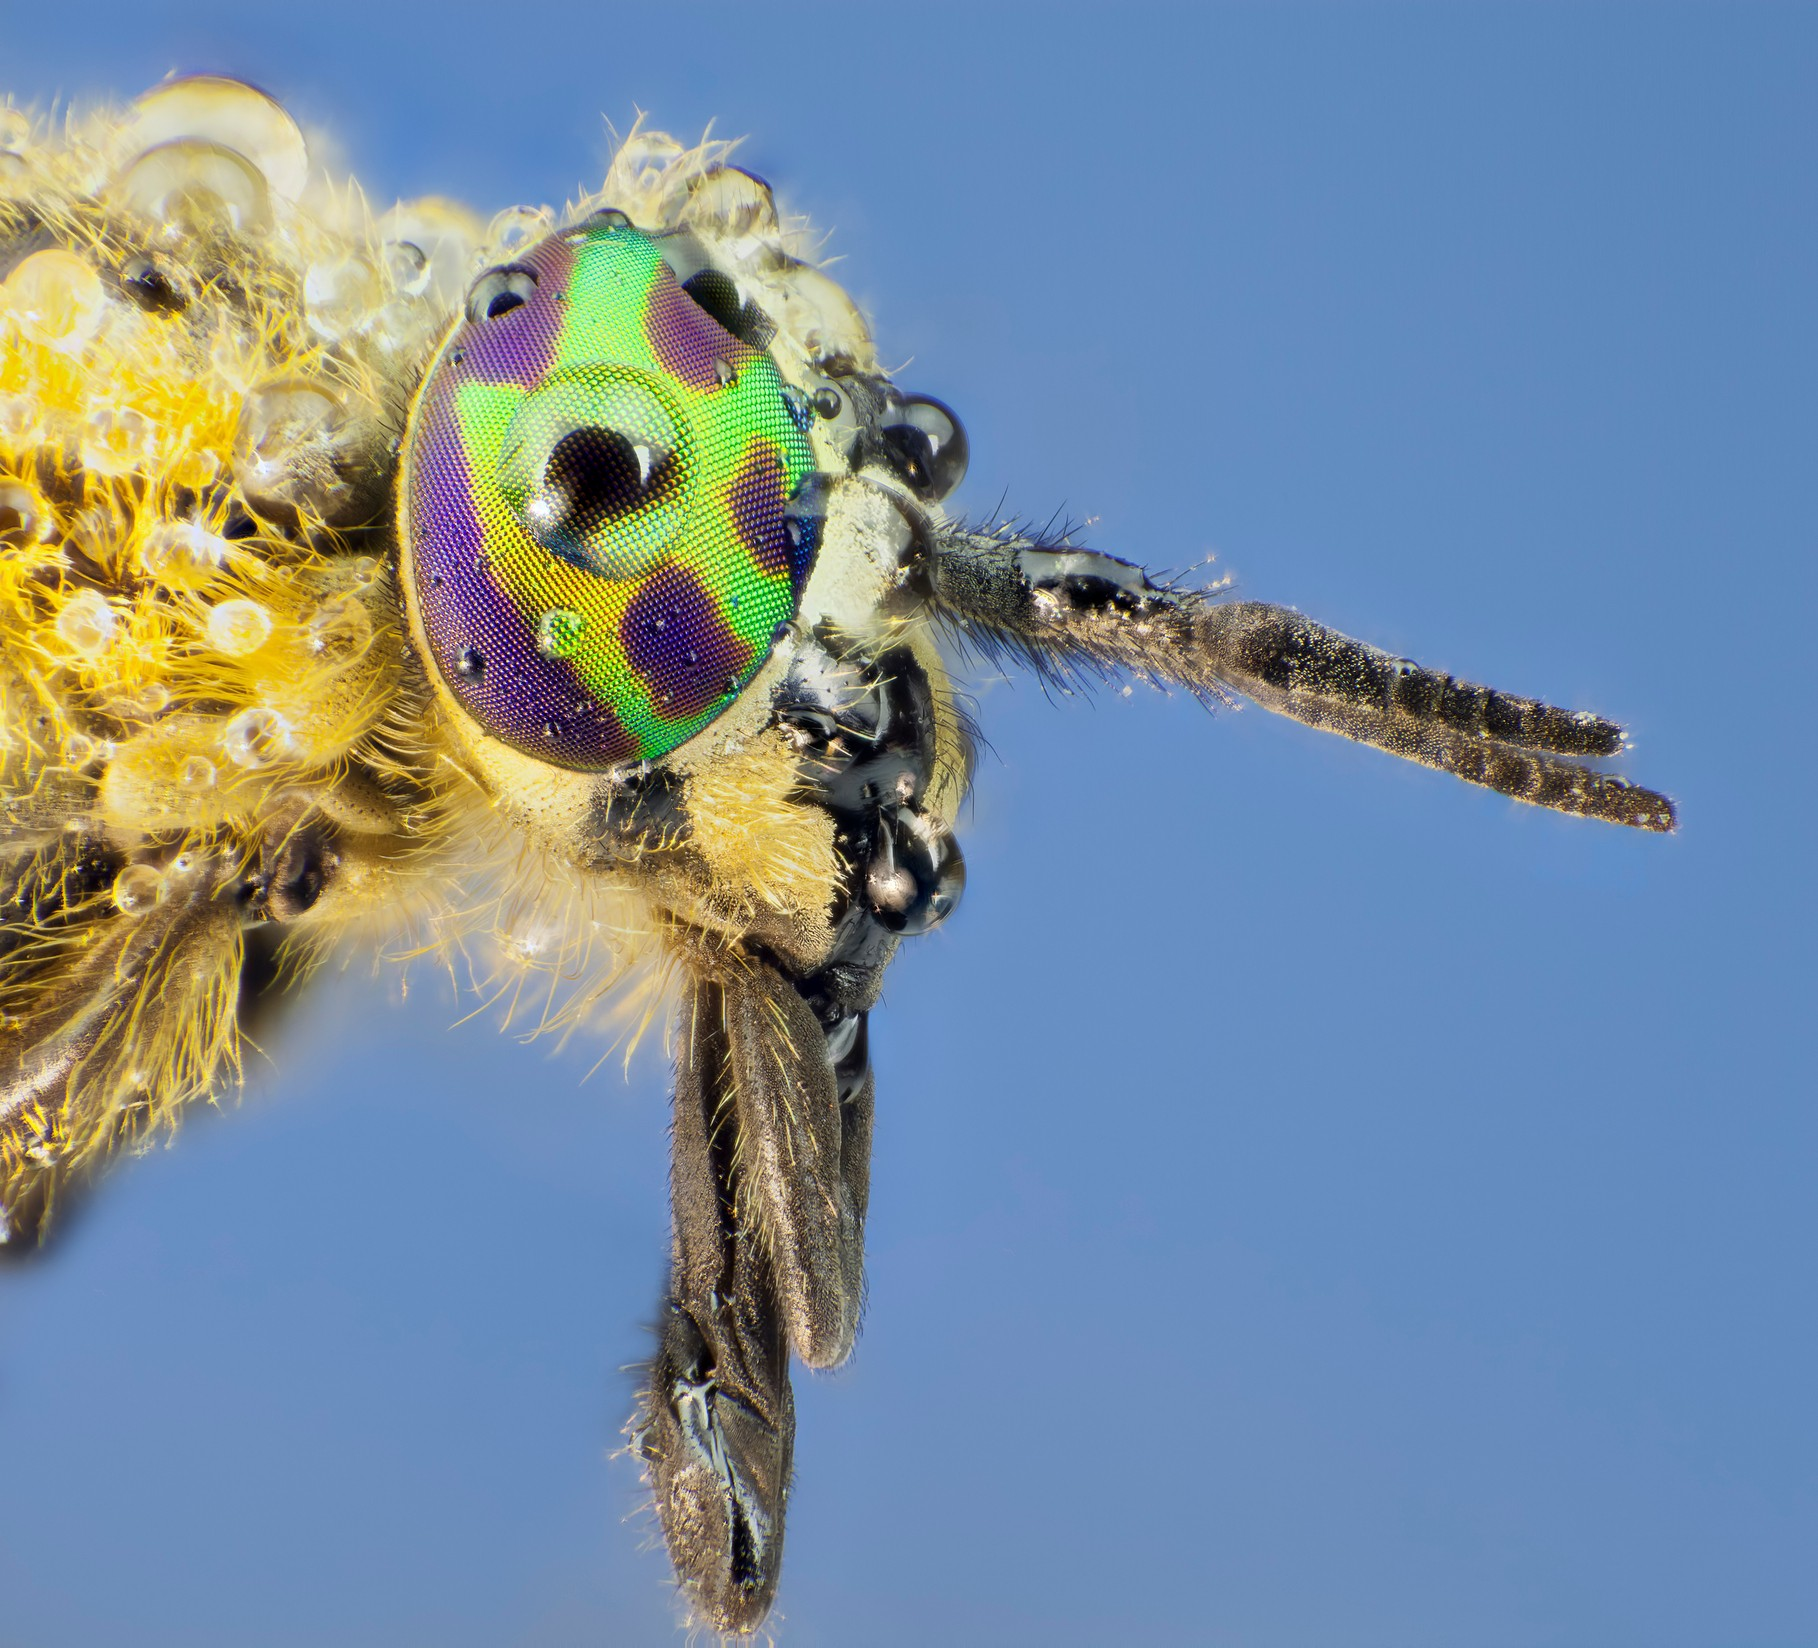 Common horsefly (H. pluvialis). © microman6/Getty